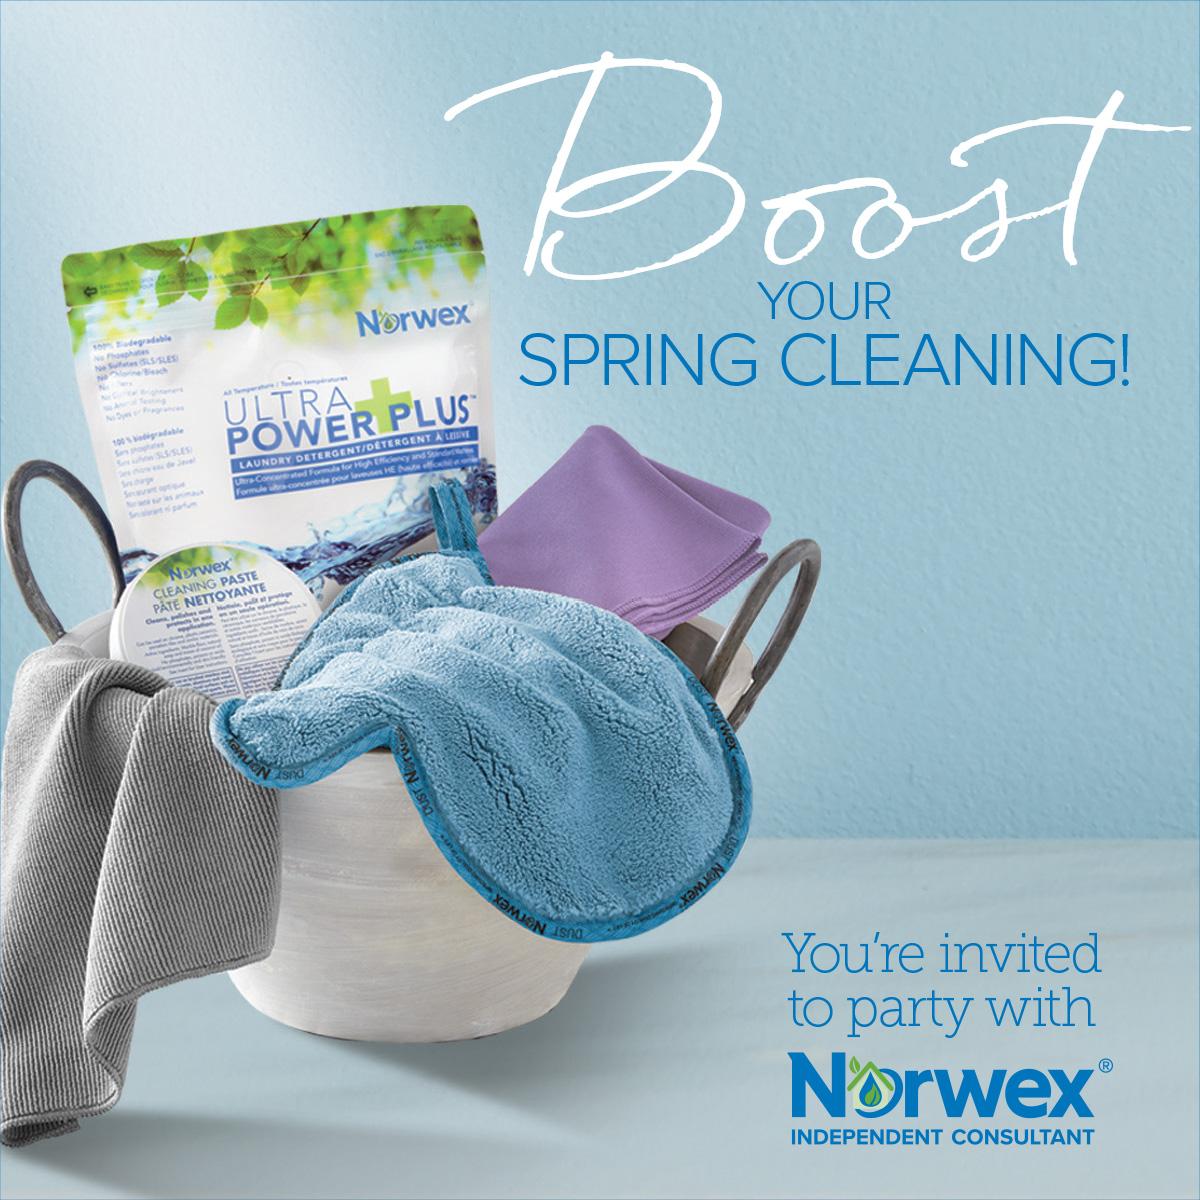 Norwex, clean chemical company, social media, social media advertisement